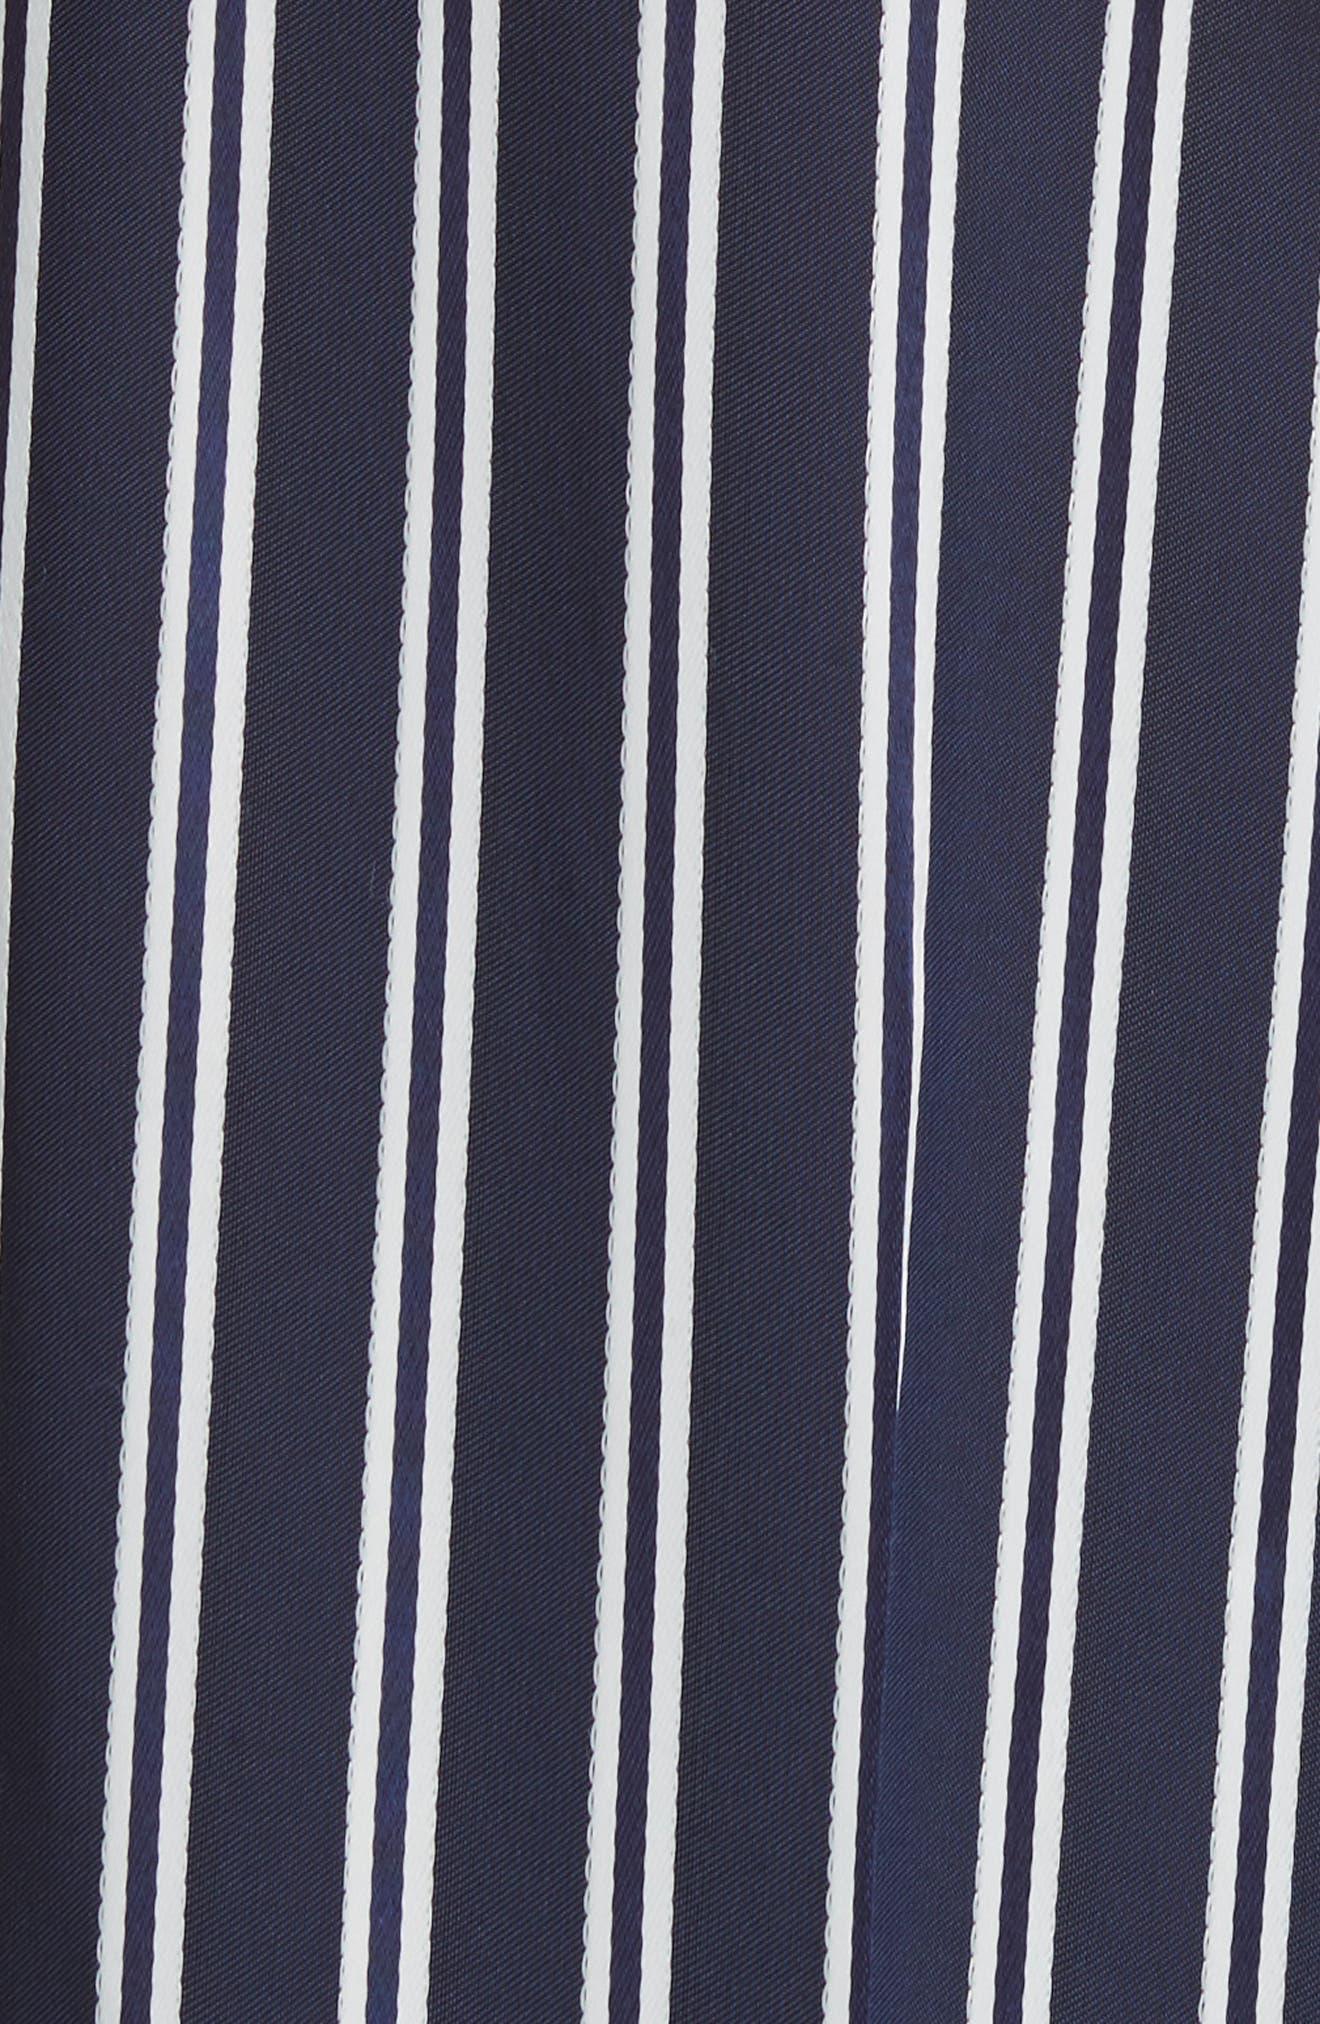 Diane von Furstenberg Stripe Palazzo Pants,                             Alternate thumbnail 5, color,